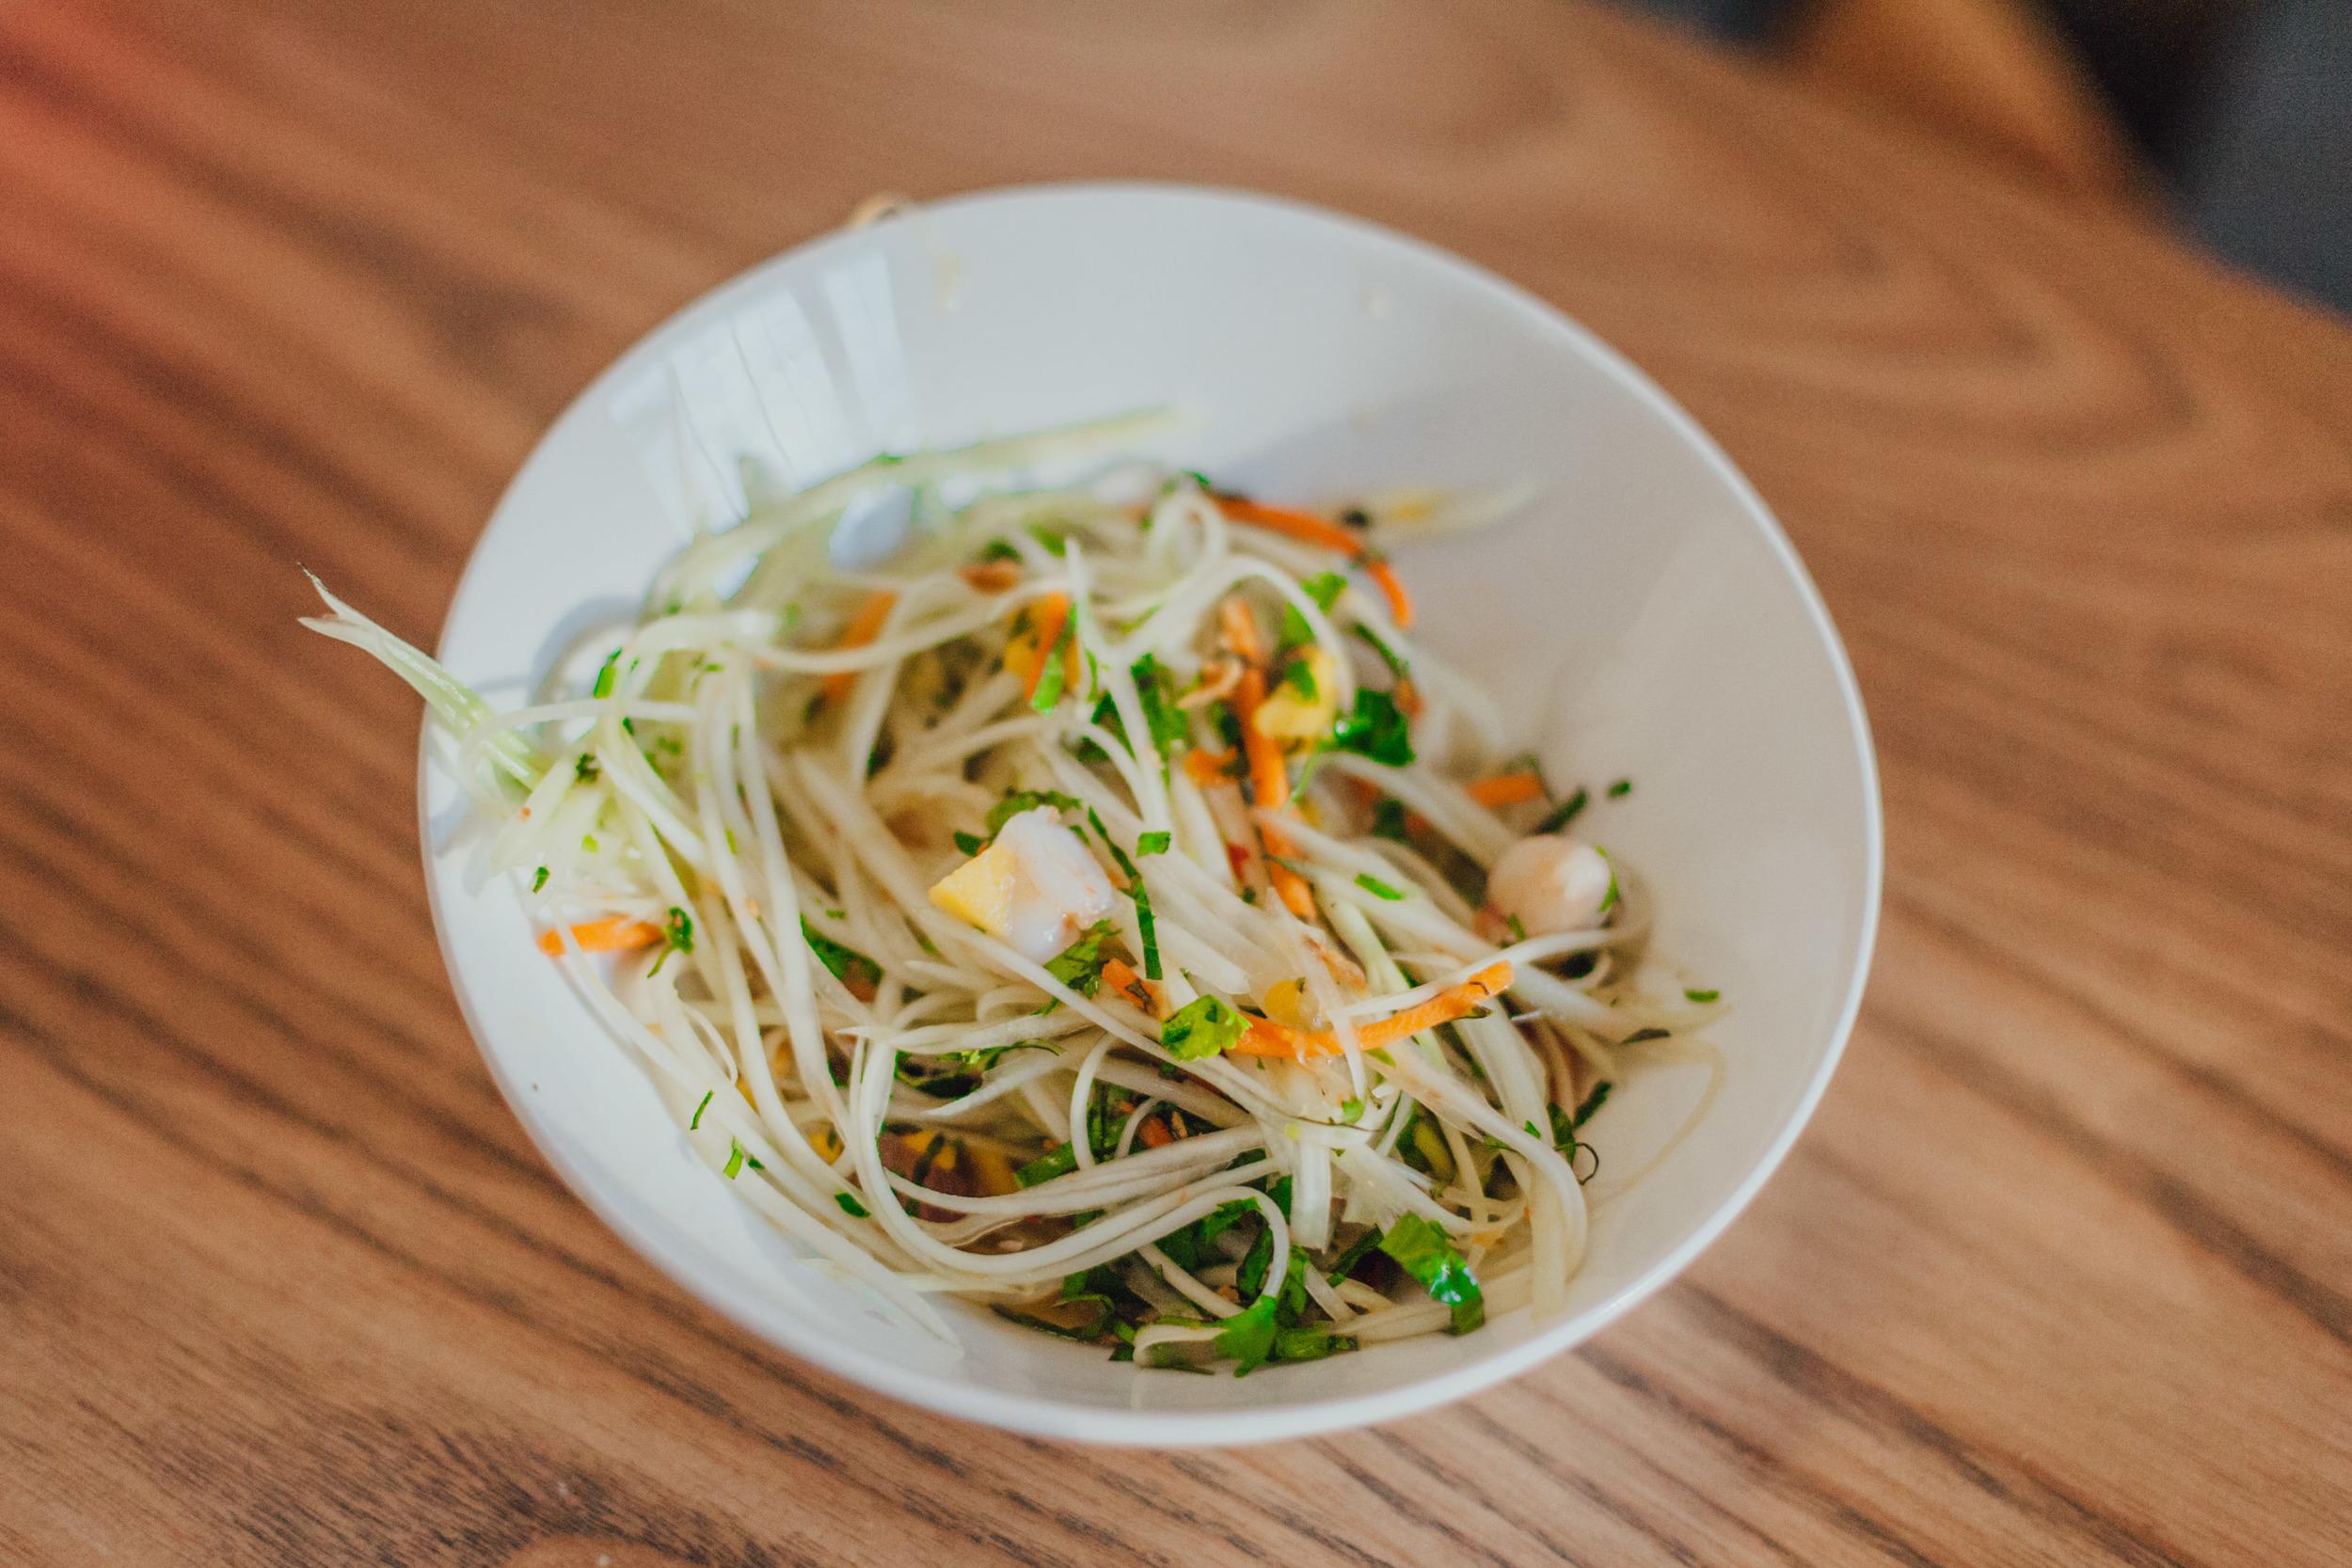 Green Papaya & Shrimp Salad:Poached shrimp, green papaya, carrots, basil, and cilantro tossed in spicy Vietnamese vinaigrette dressing. Topped with mango salsa, fried shallots, and roasted peanuts.